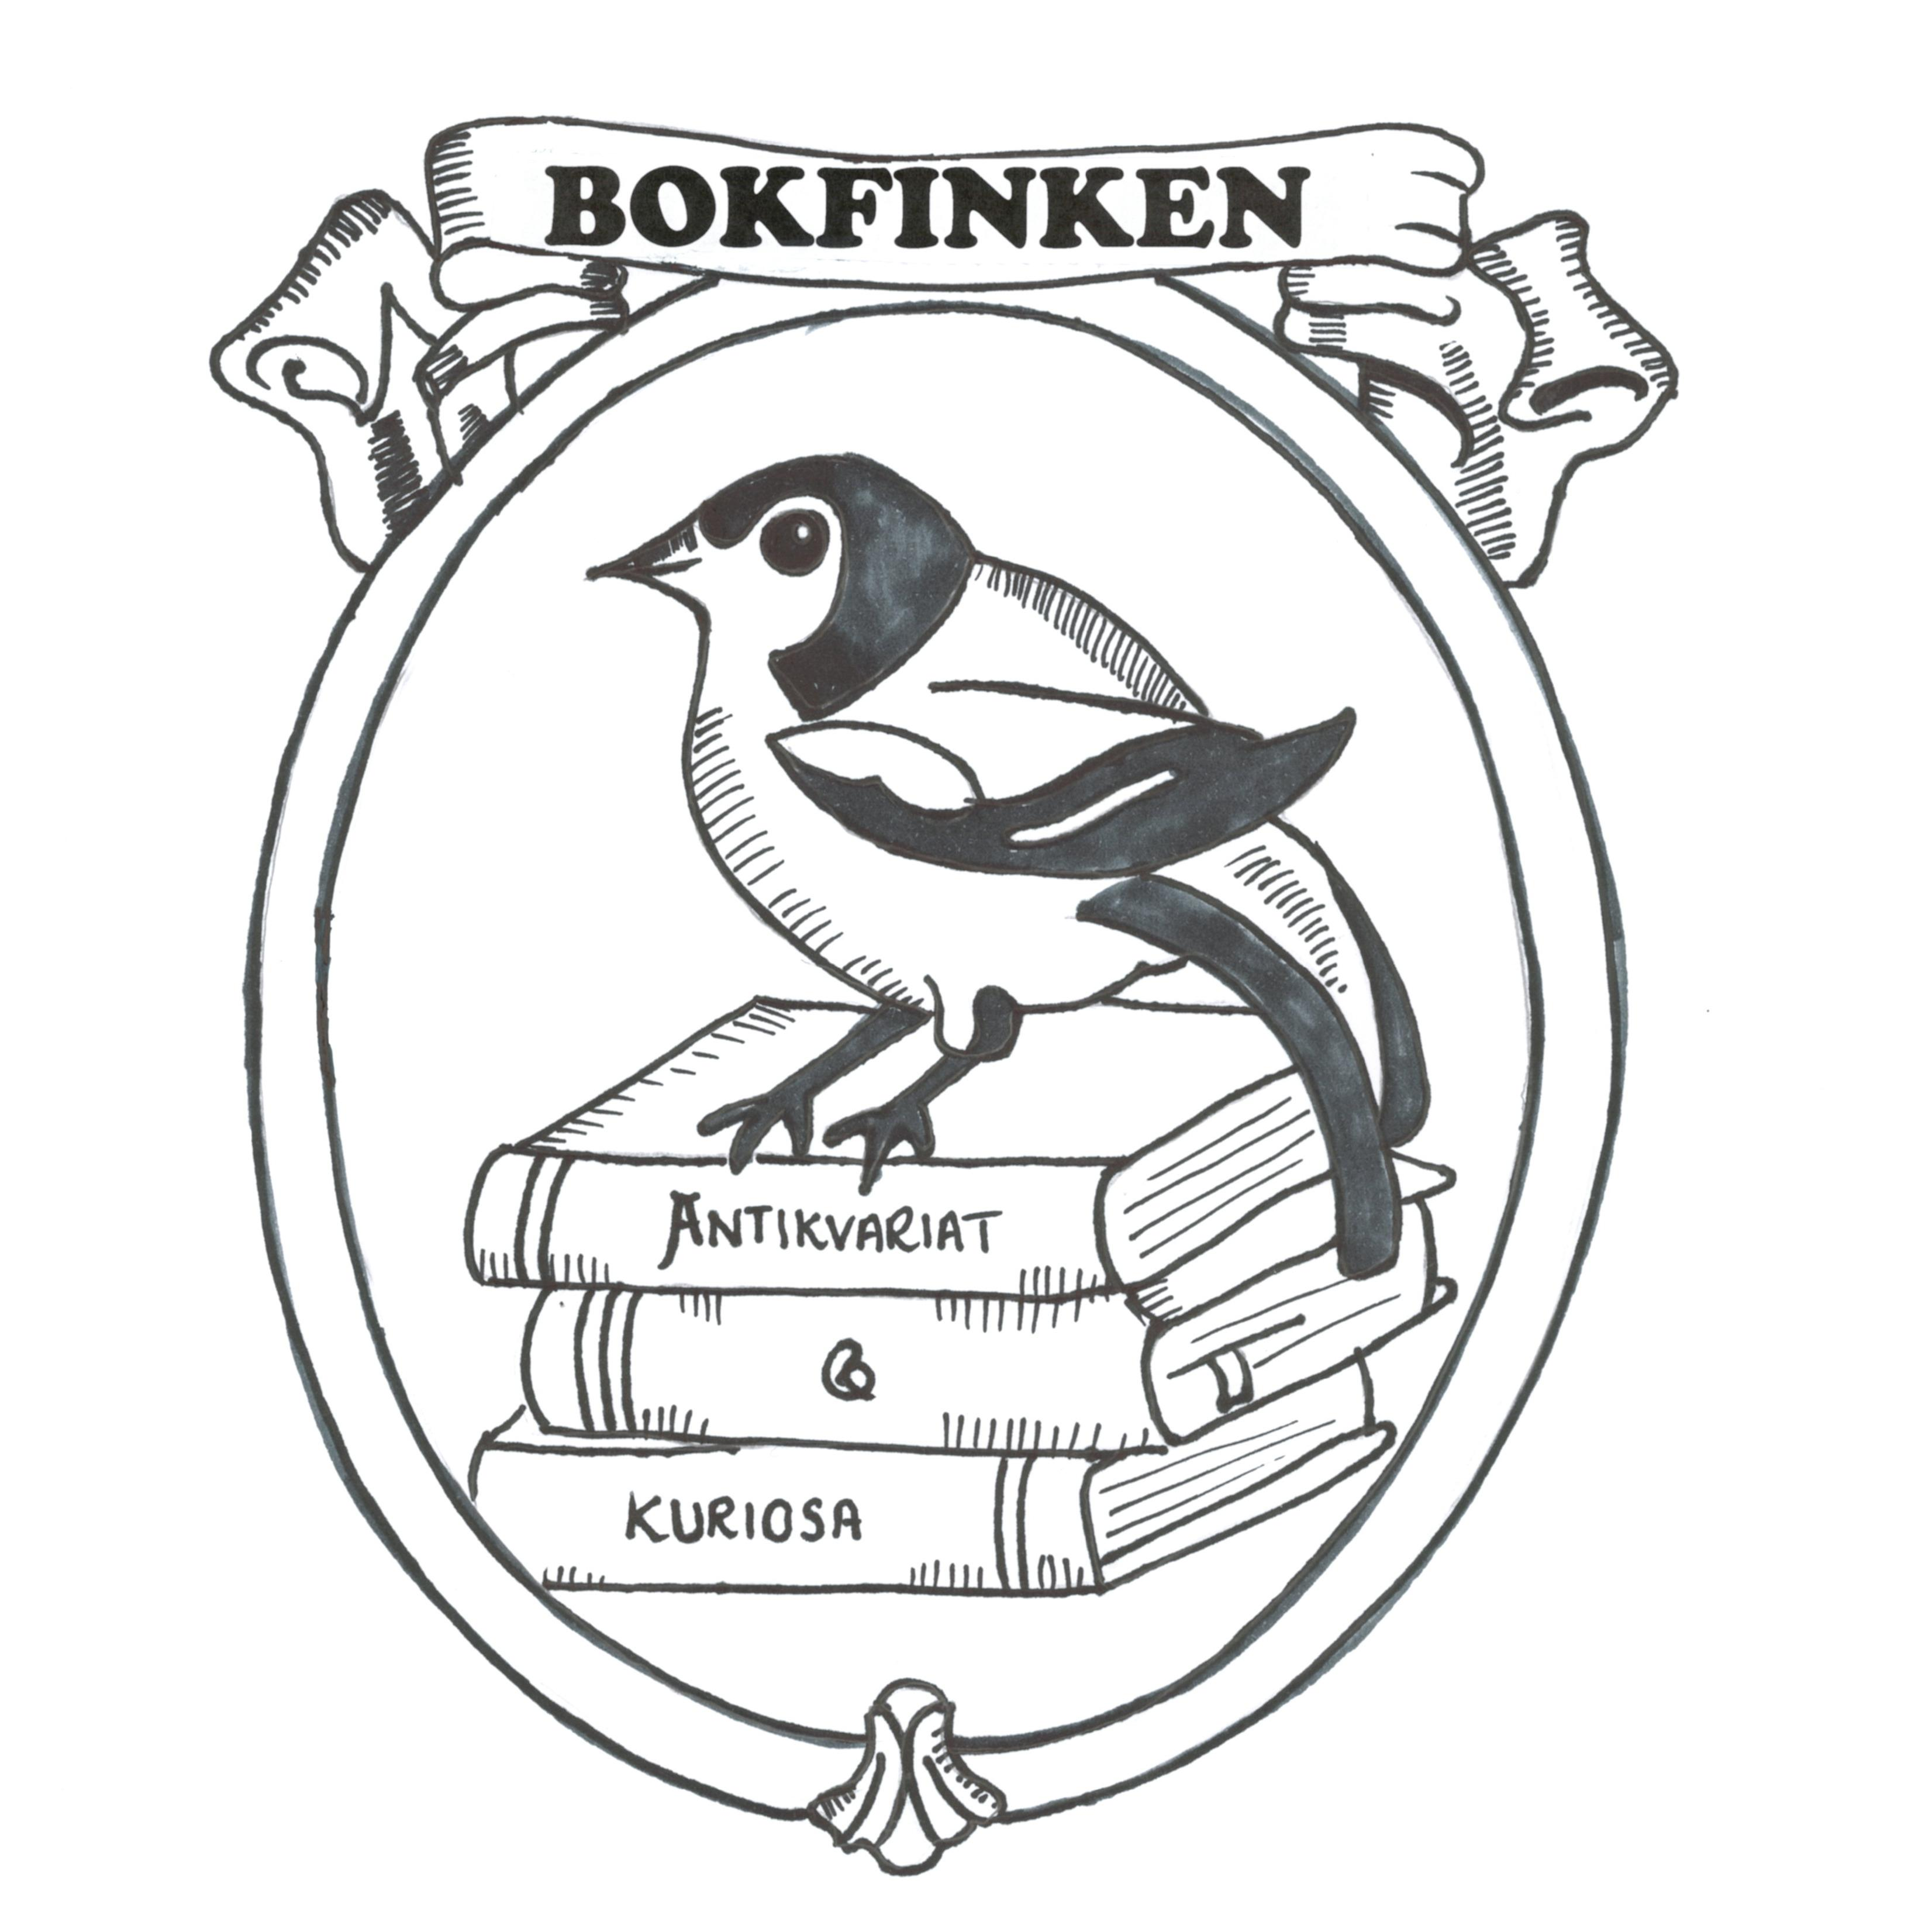 Bokfinken - Antikvariat & Kuriosa